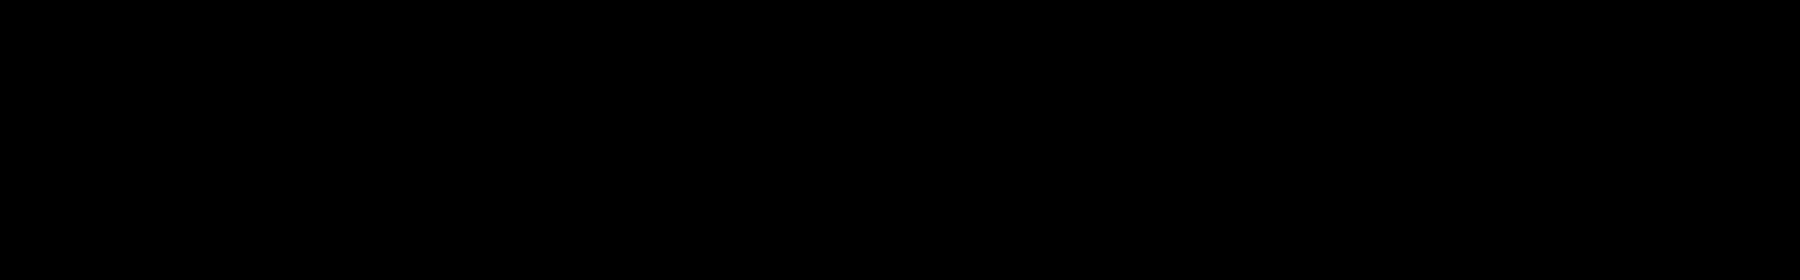 Fundamental Liquid DNB audio waveform